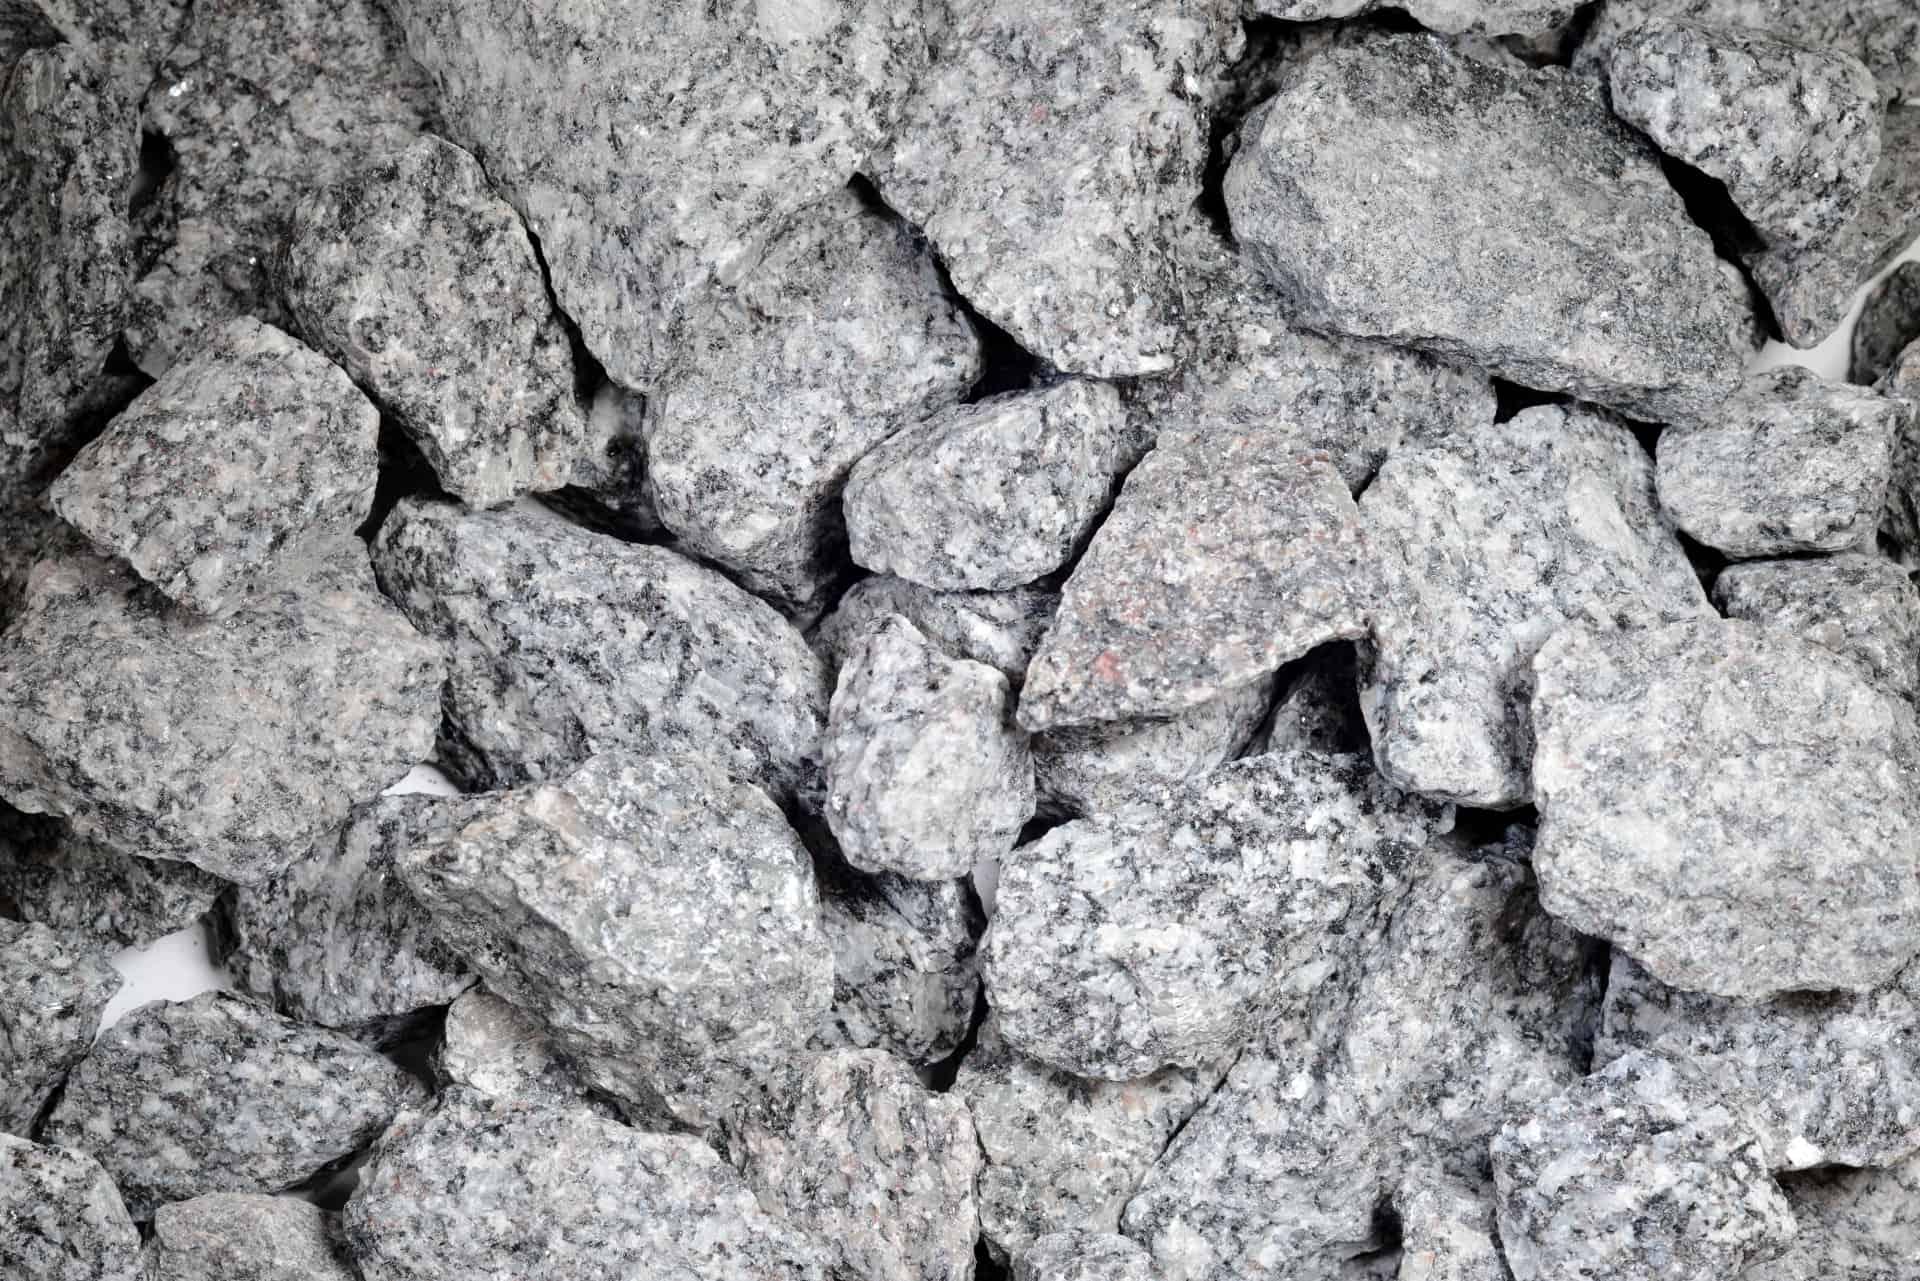 Granit grau 32-56mm - Sack vor Orth - Heidelberg